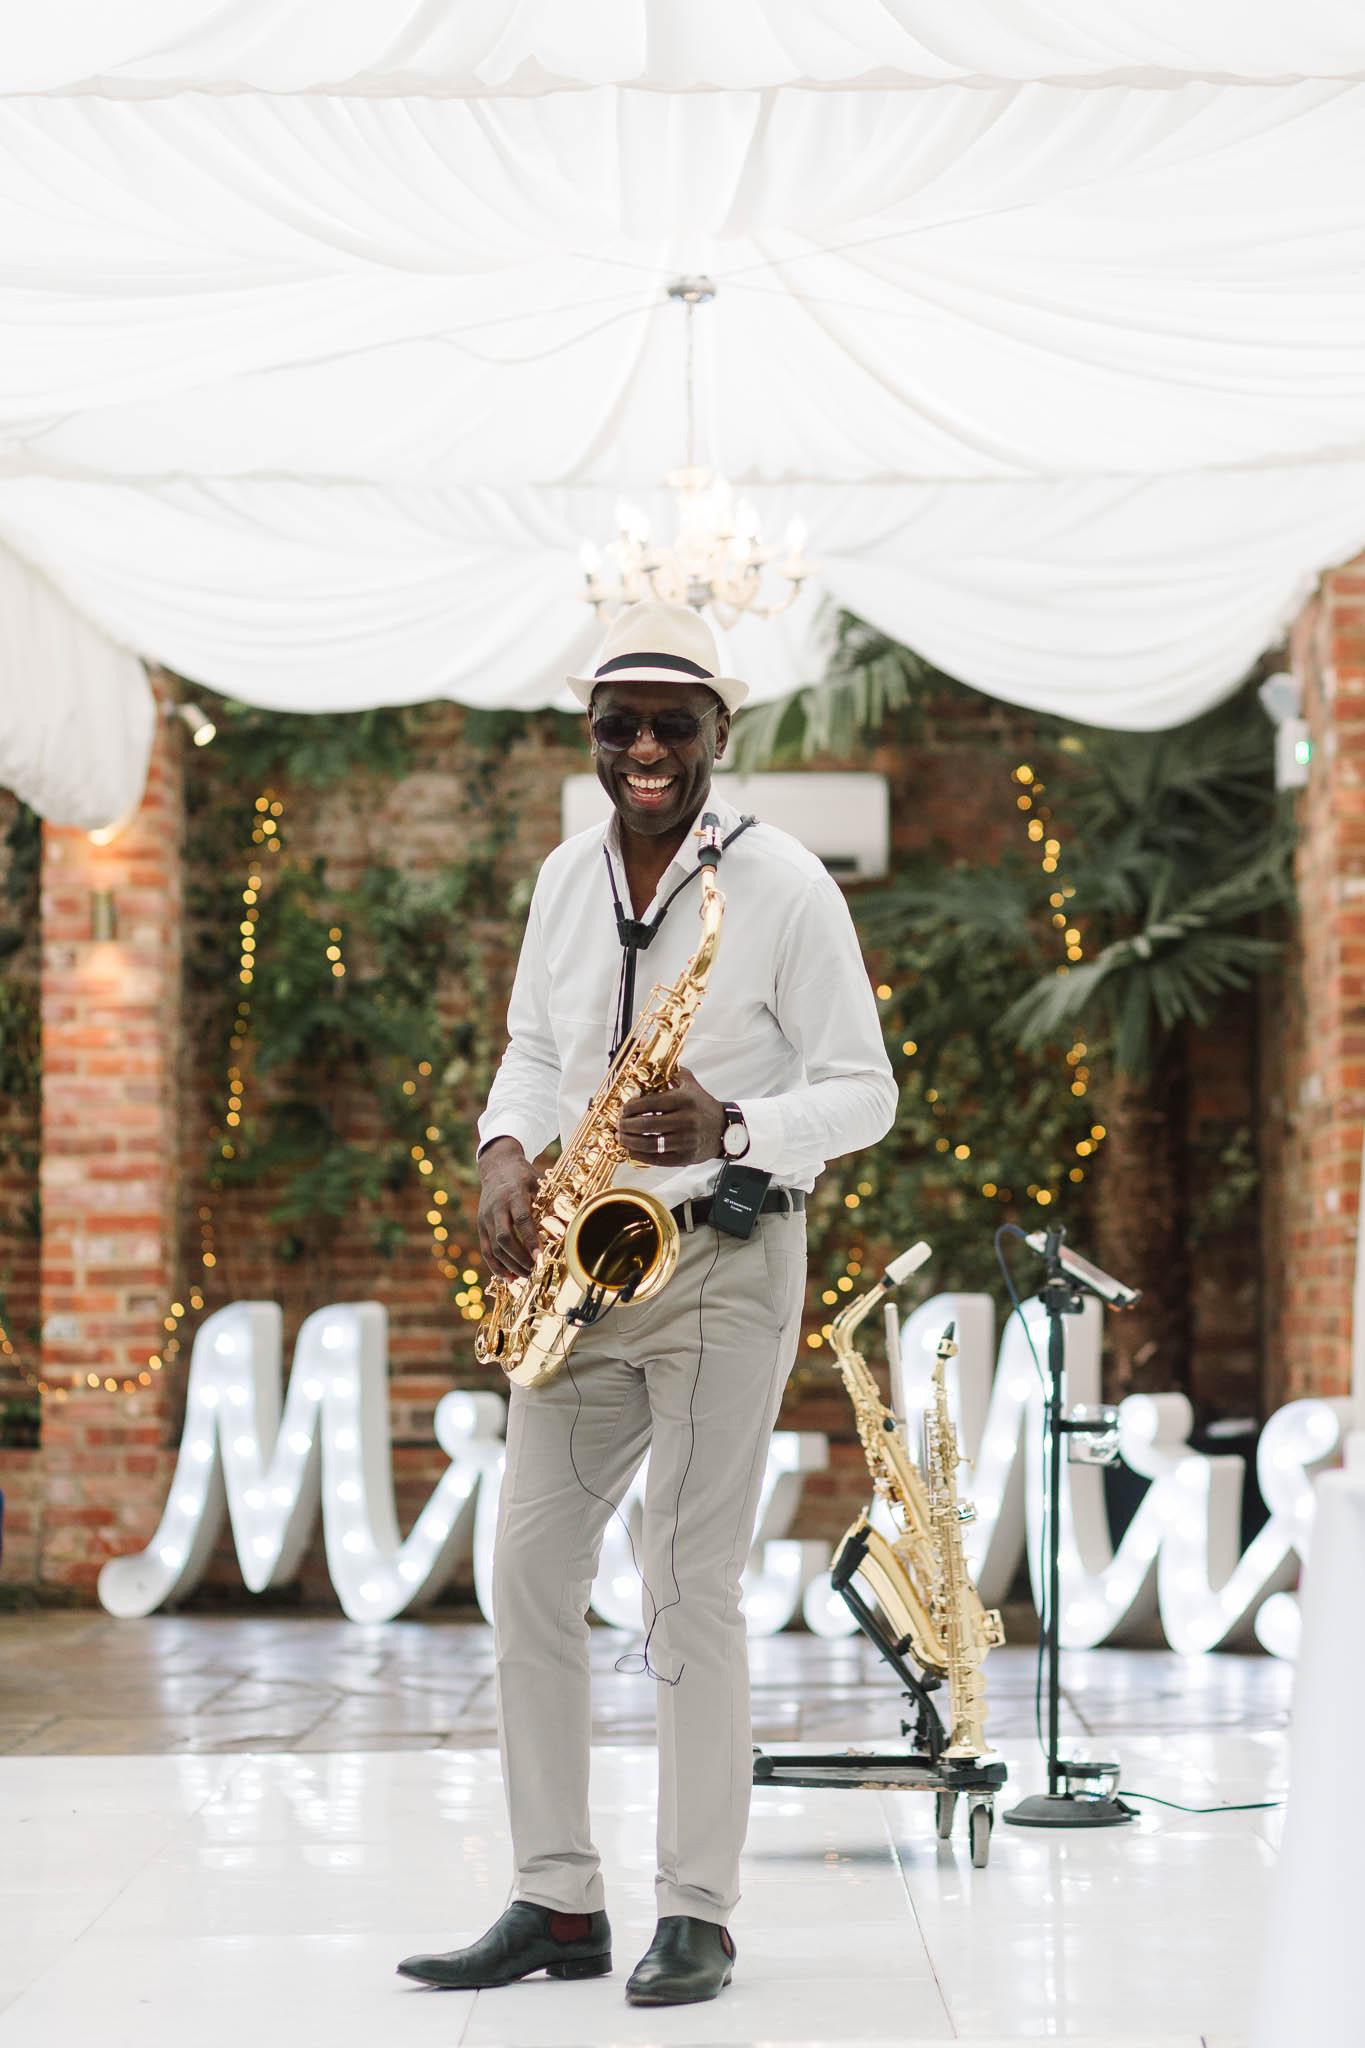 saxophonist at wedding